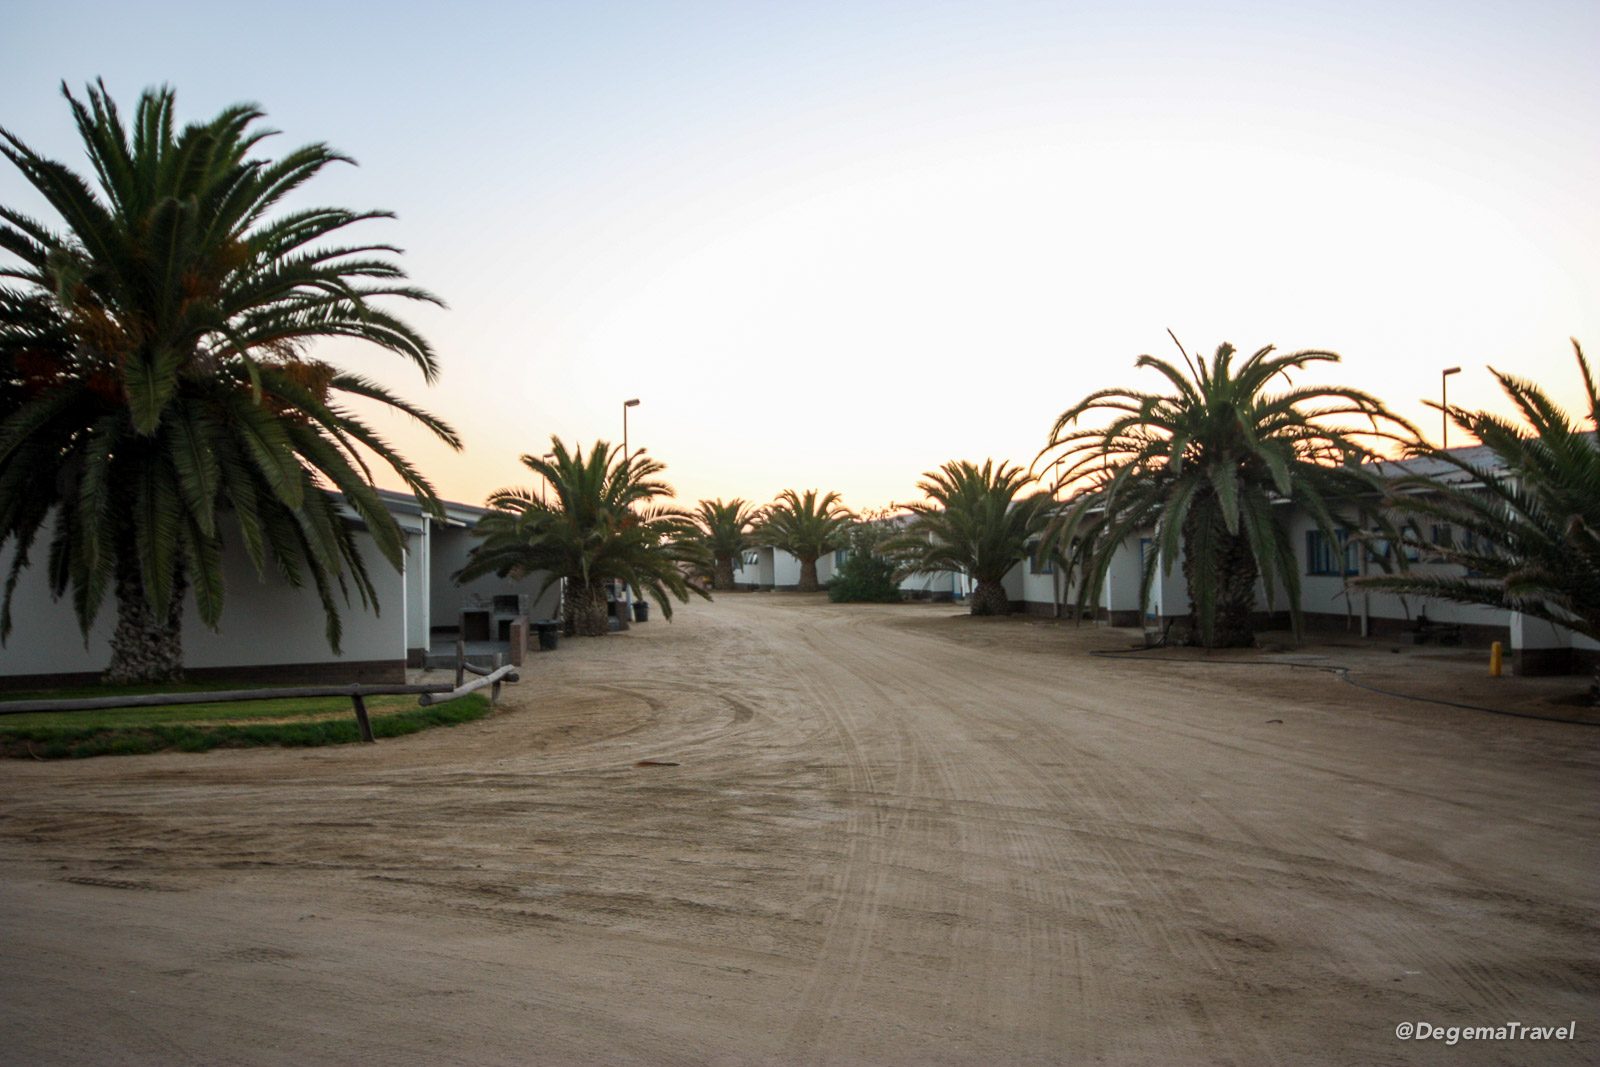 Swakopmund Municipal Restcamp, Namibia